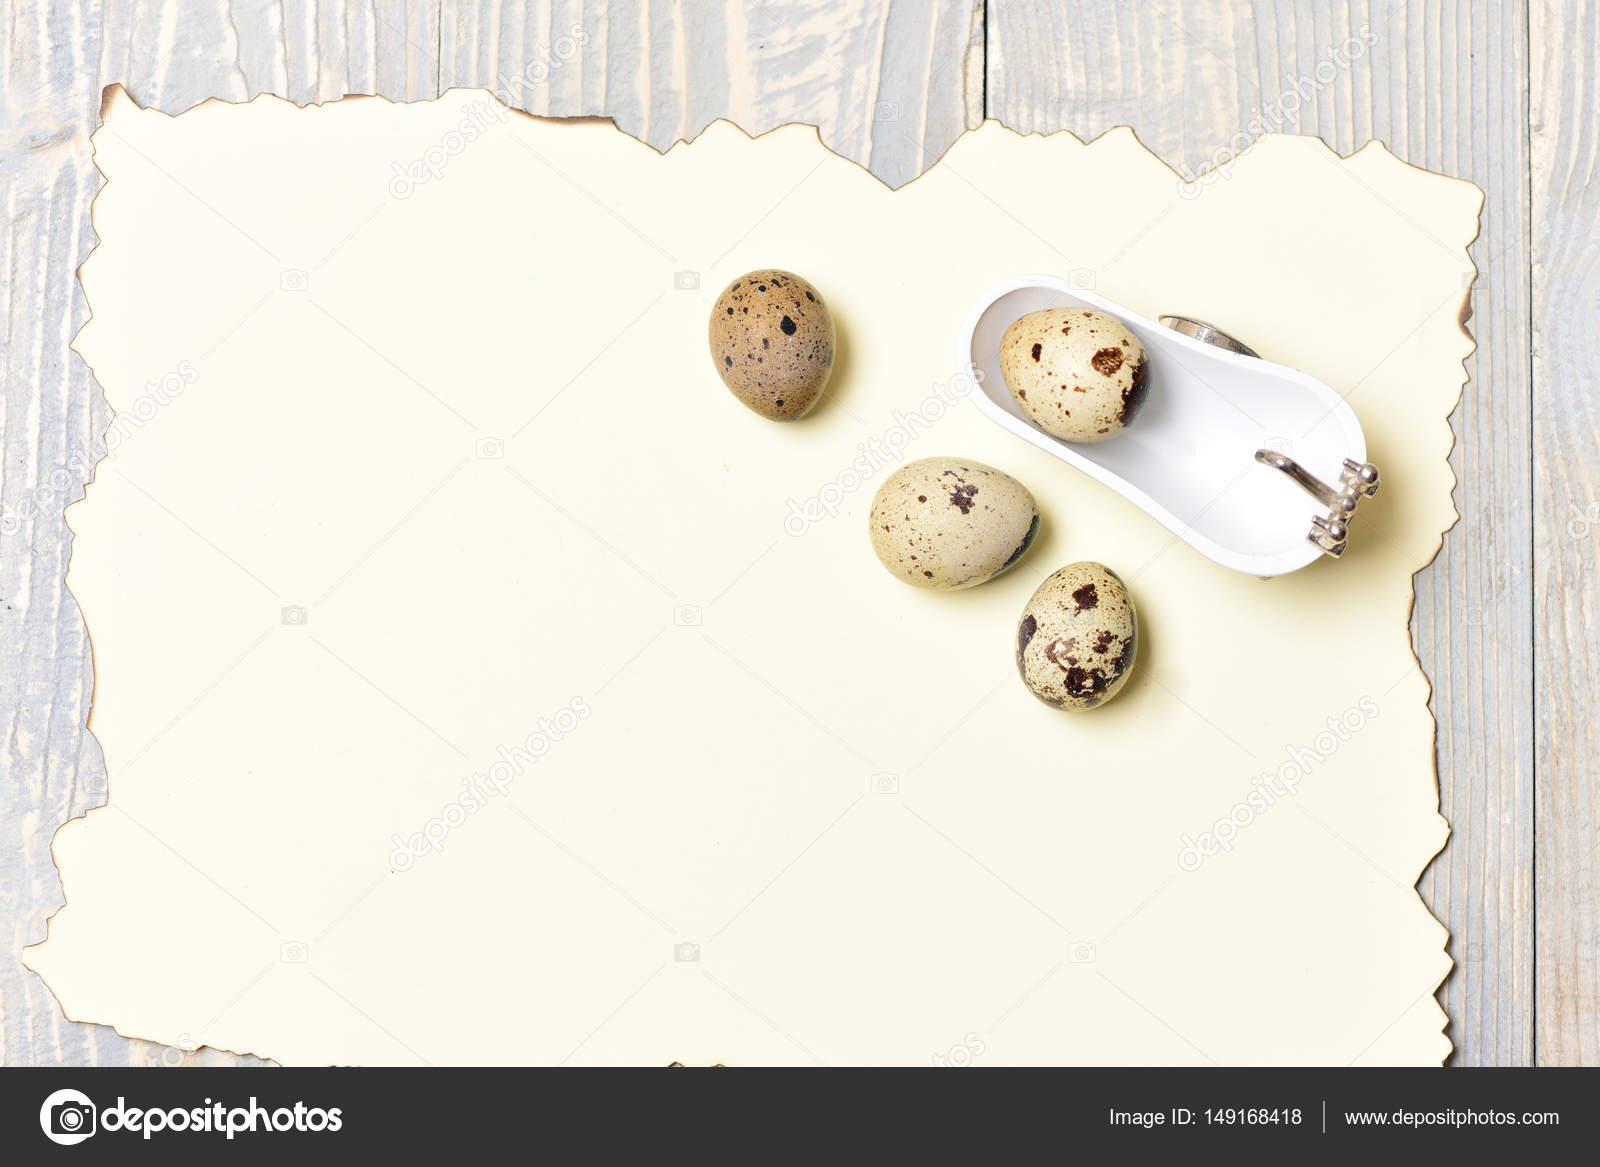 Vasca Da Bagno Uovo : Uova di quaglia in vasca da bagno bianco con carta vacanze di